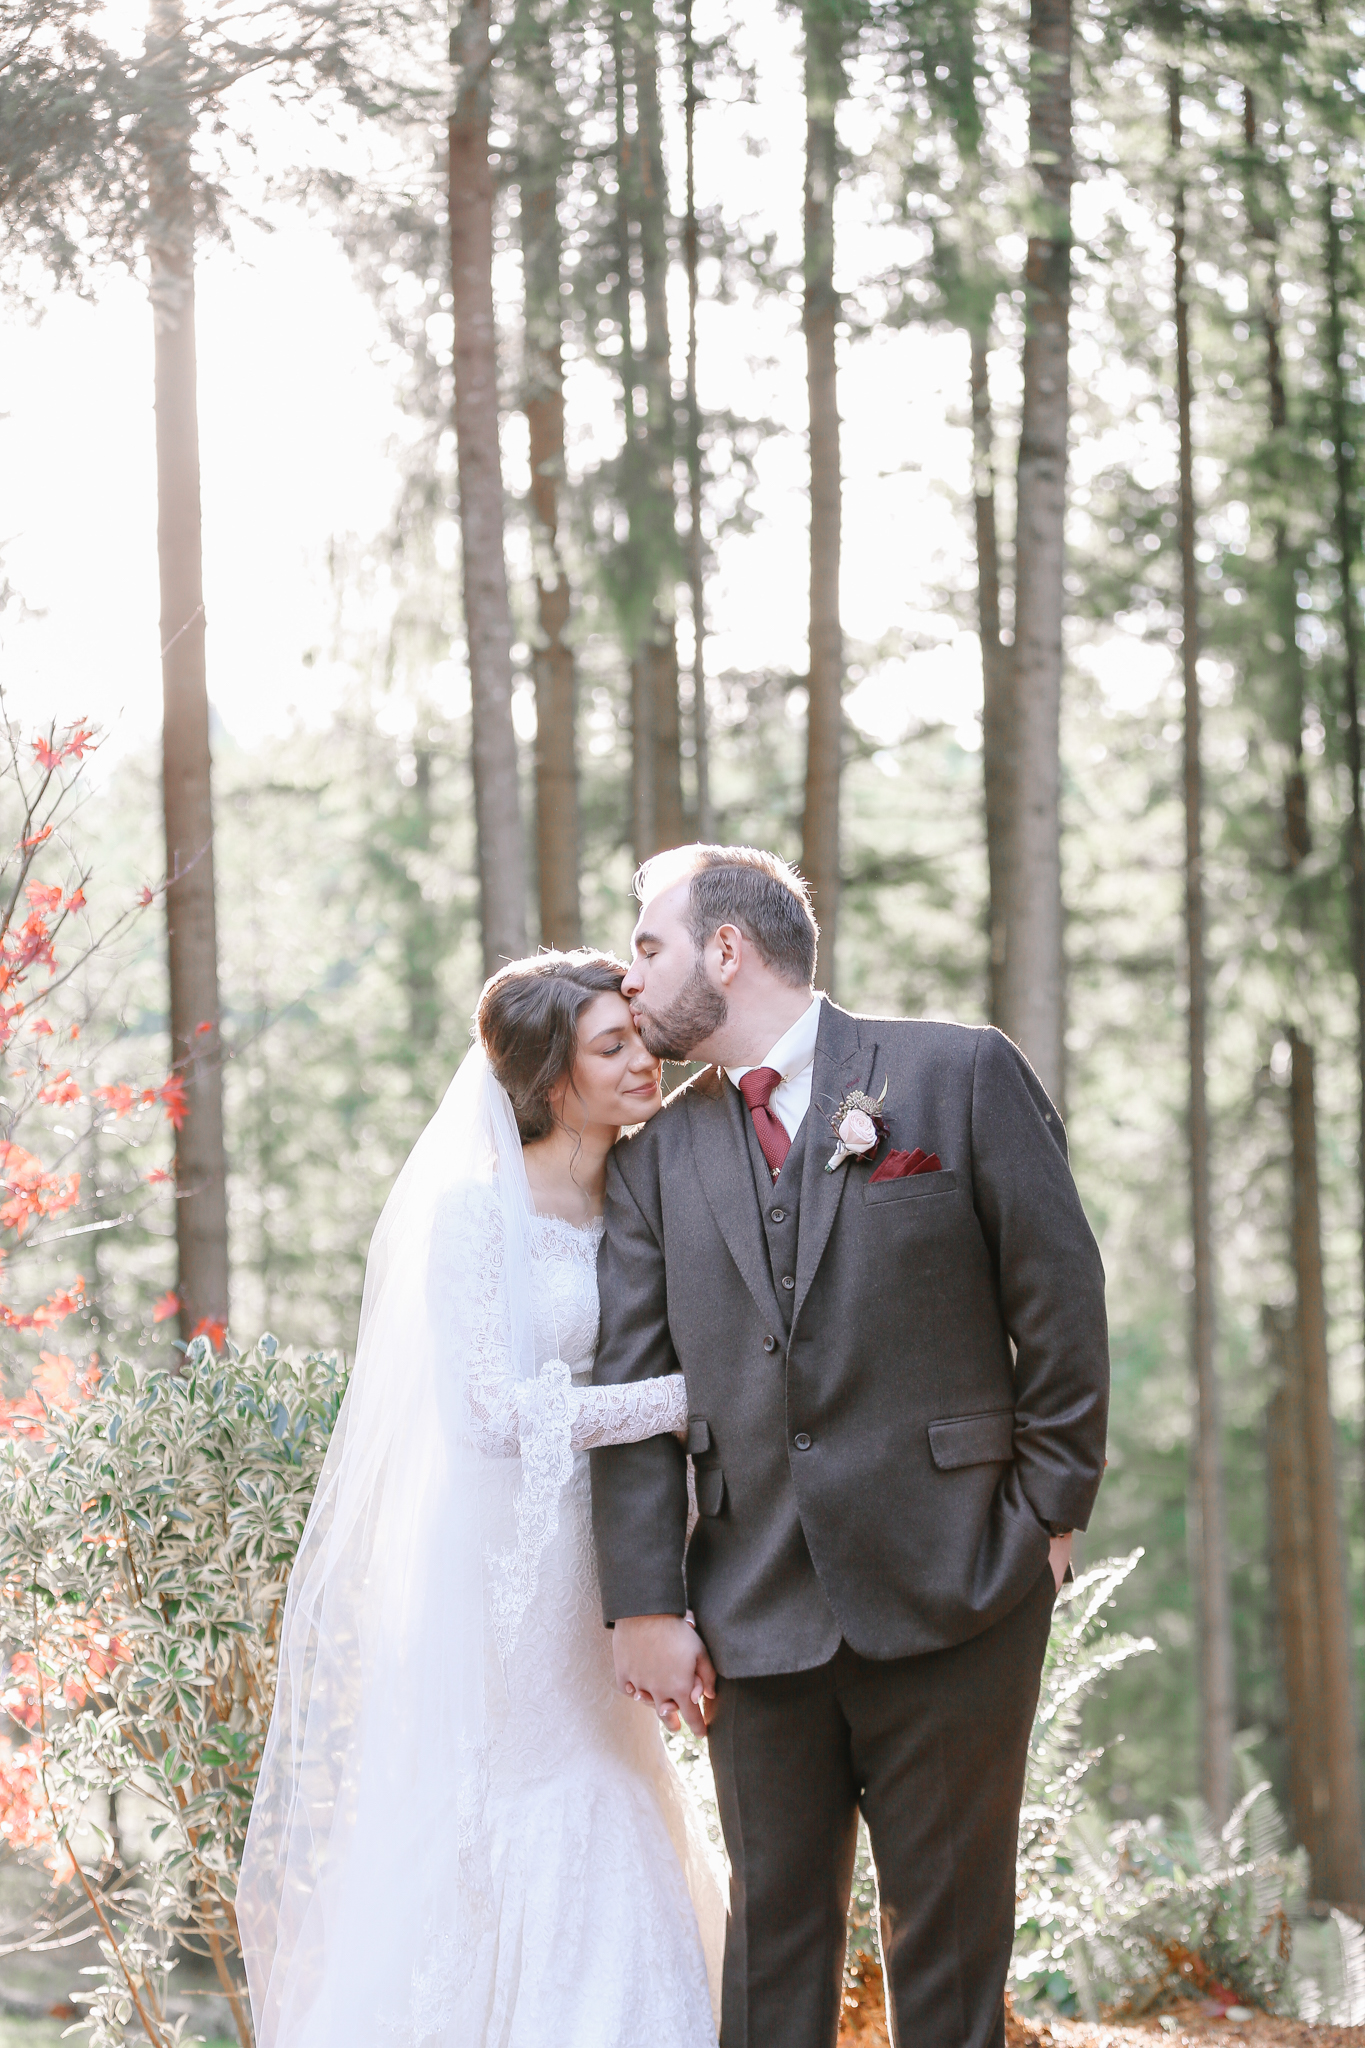 Manu and Laura - Portland Wedding Photographer - 32.jpg